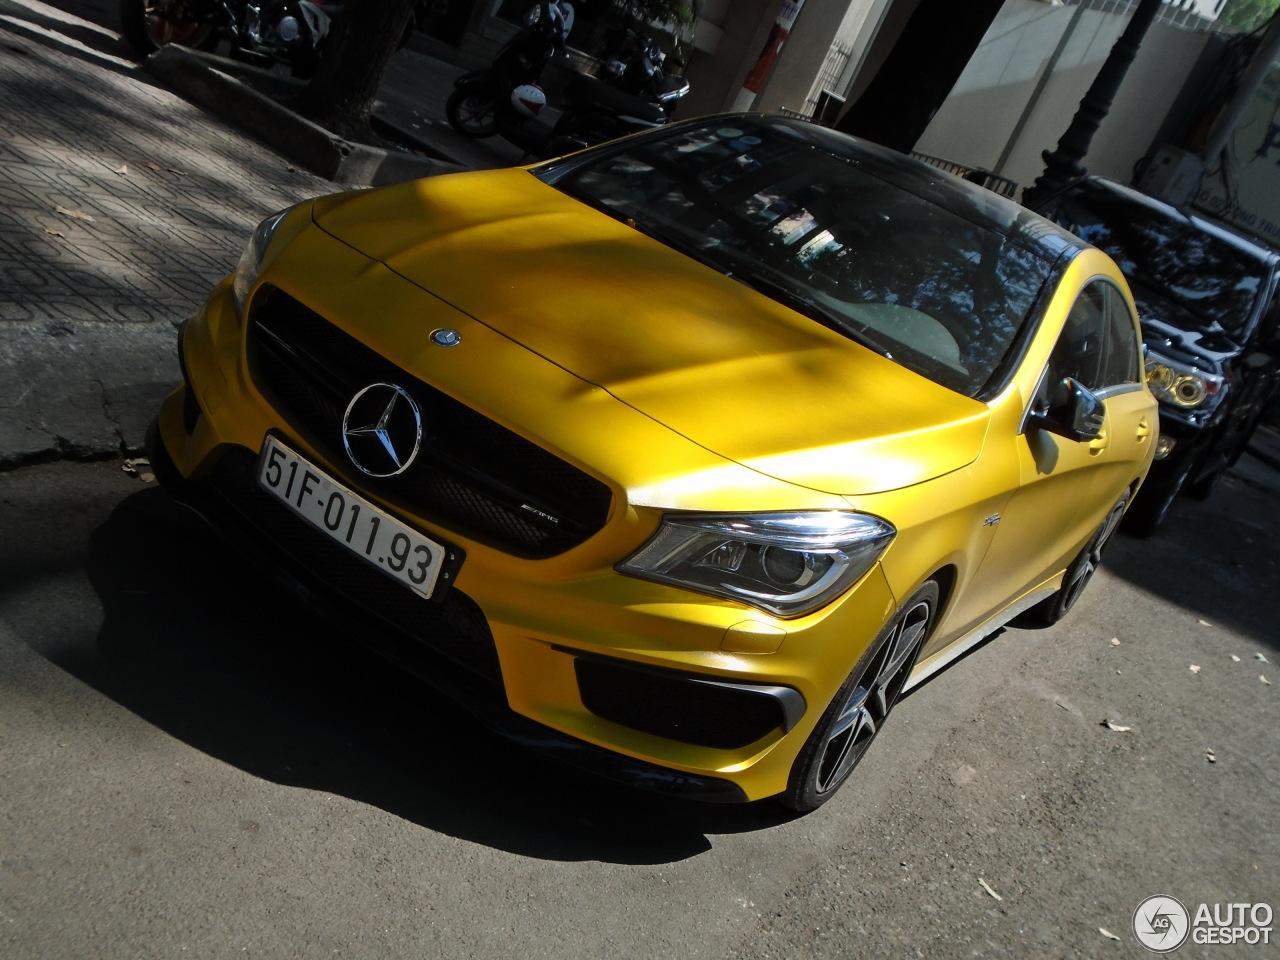 Mercedes benz cla 45 amg c117 14 february 2016 autogespot for Mercedes benz cla 45 price